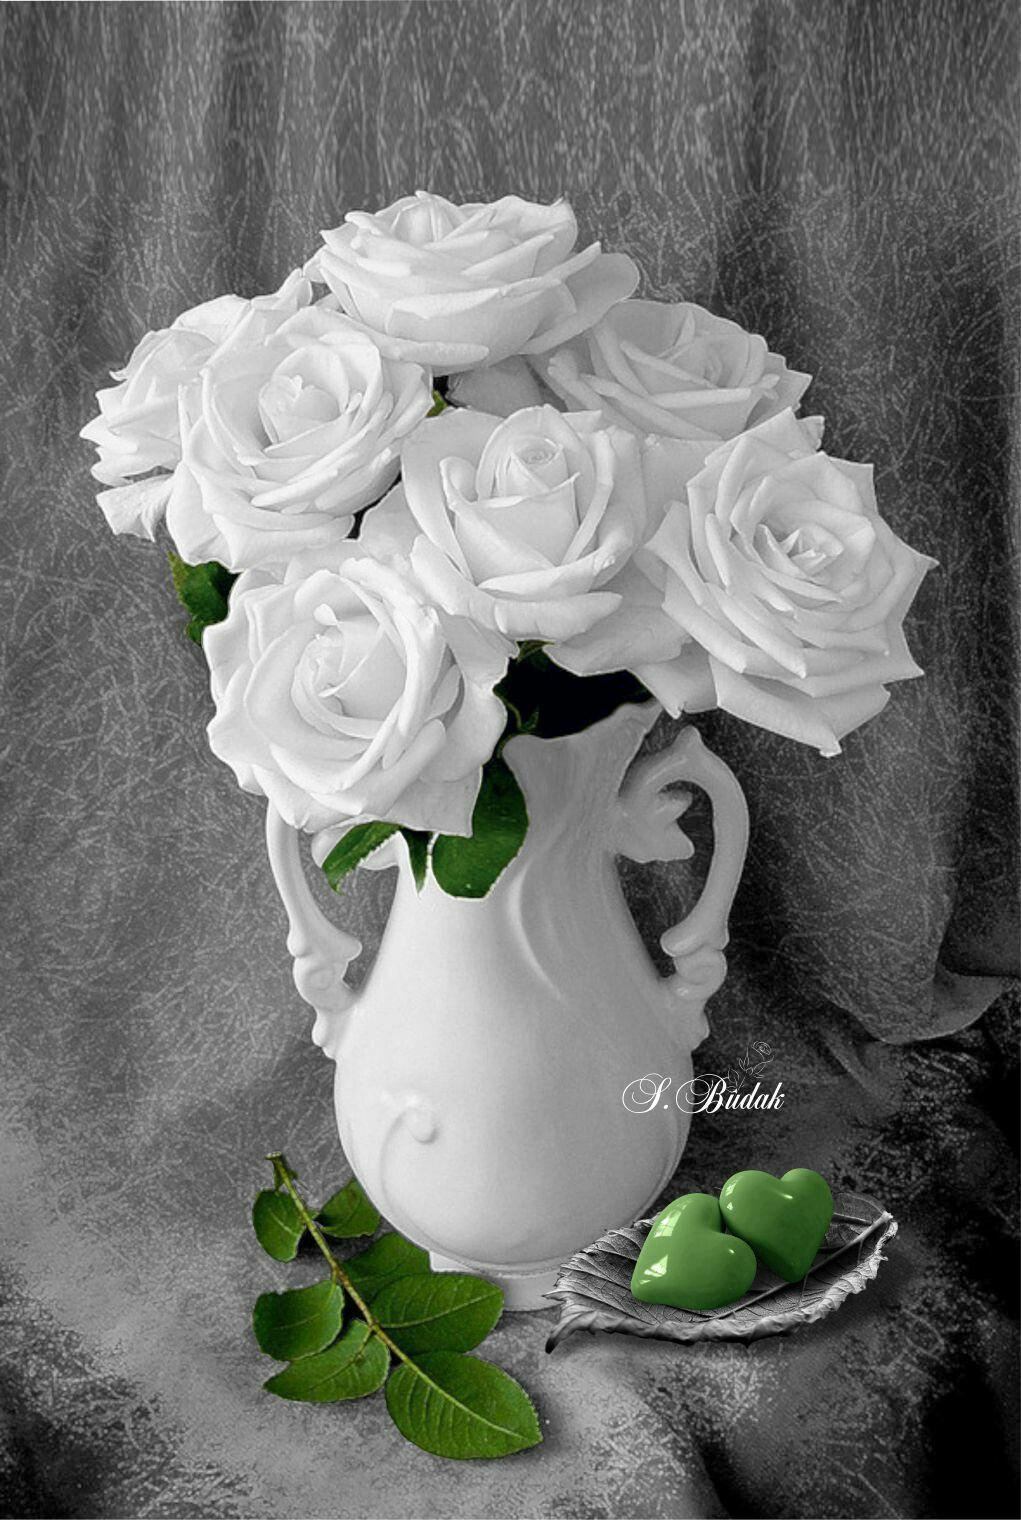 Photographer Sabri Budak Green Color Splash Photography Color Splash Art Color Splash Photography Beautiful Roses